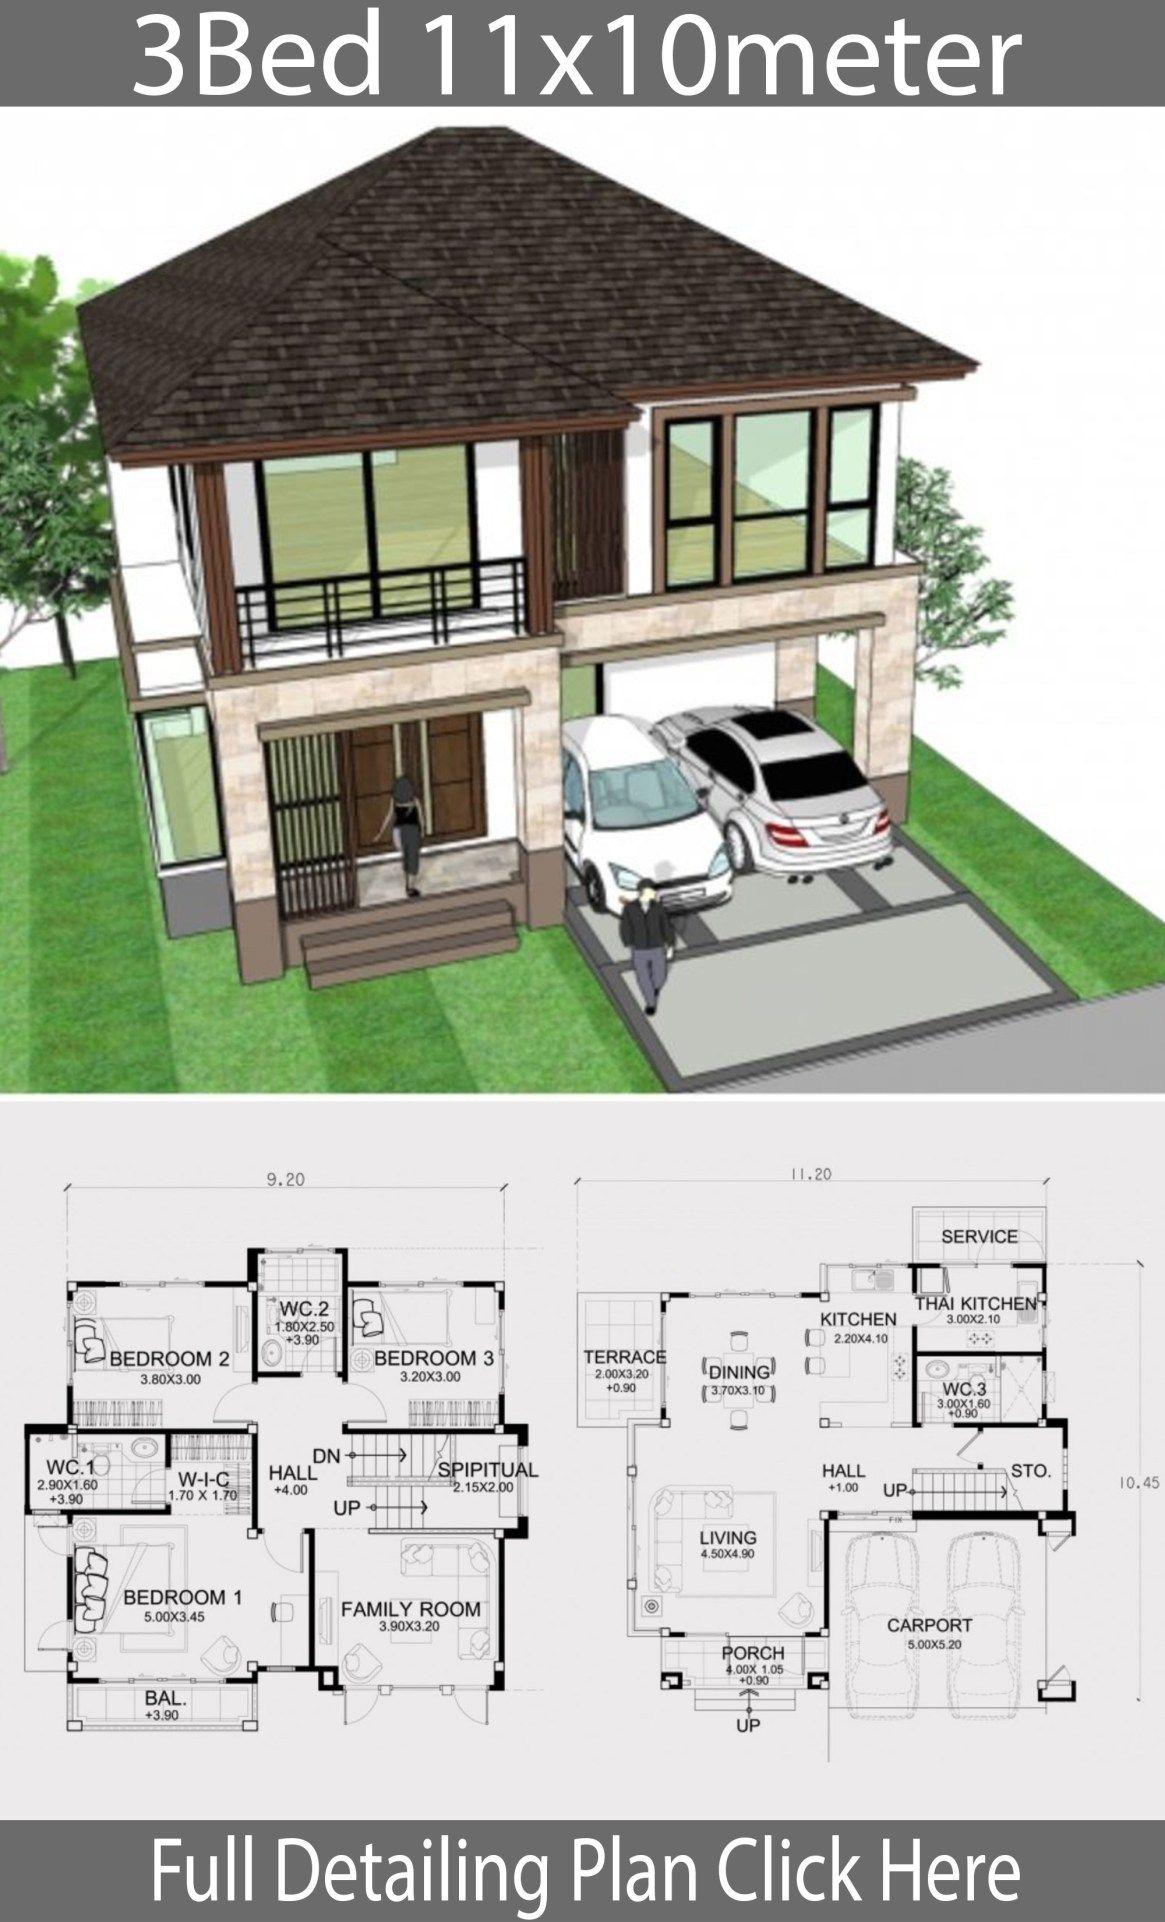 Home Design Plan 11x10m With 3 Bedrooms Home Design With Plansearch House Design Home Design Plan Home Design Plans